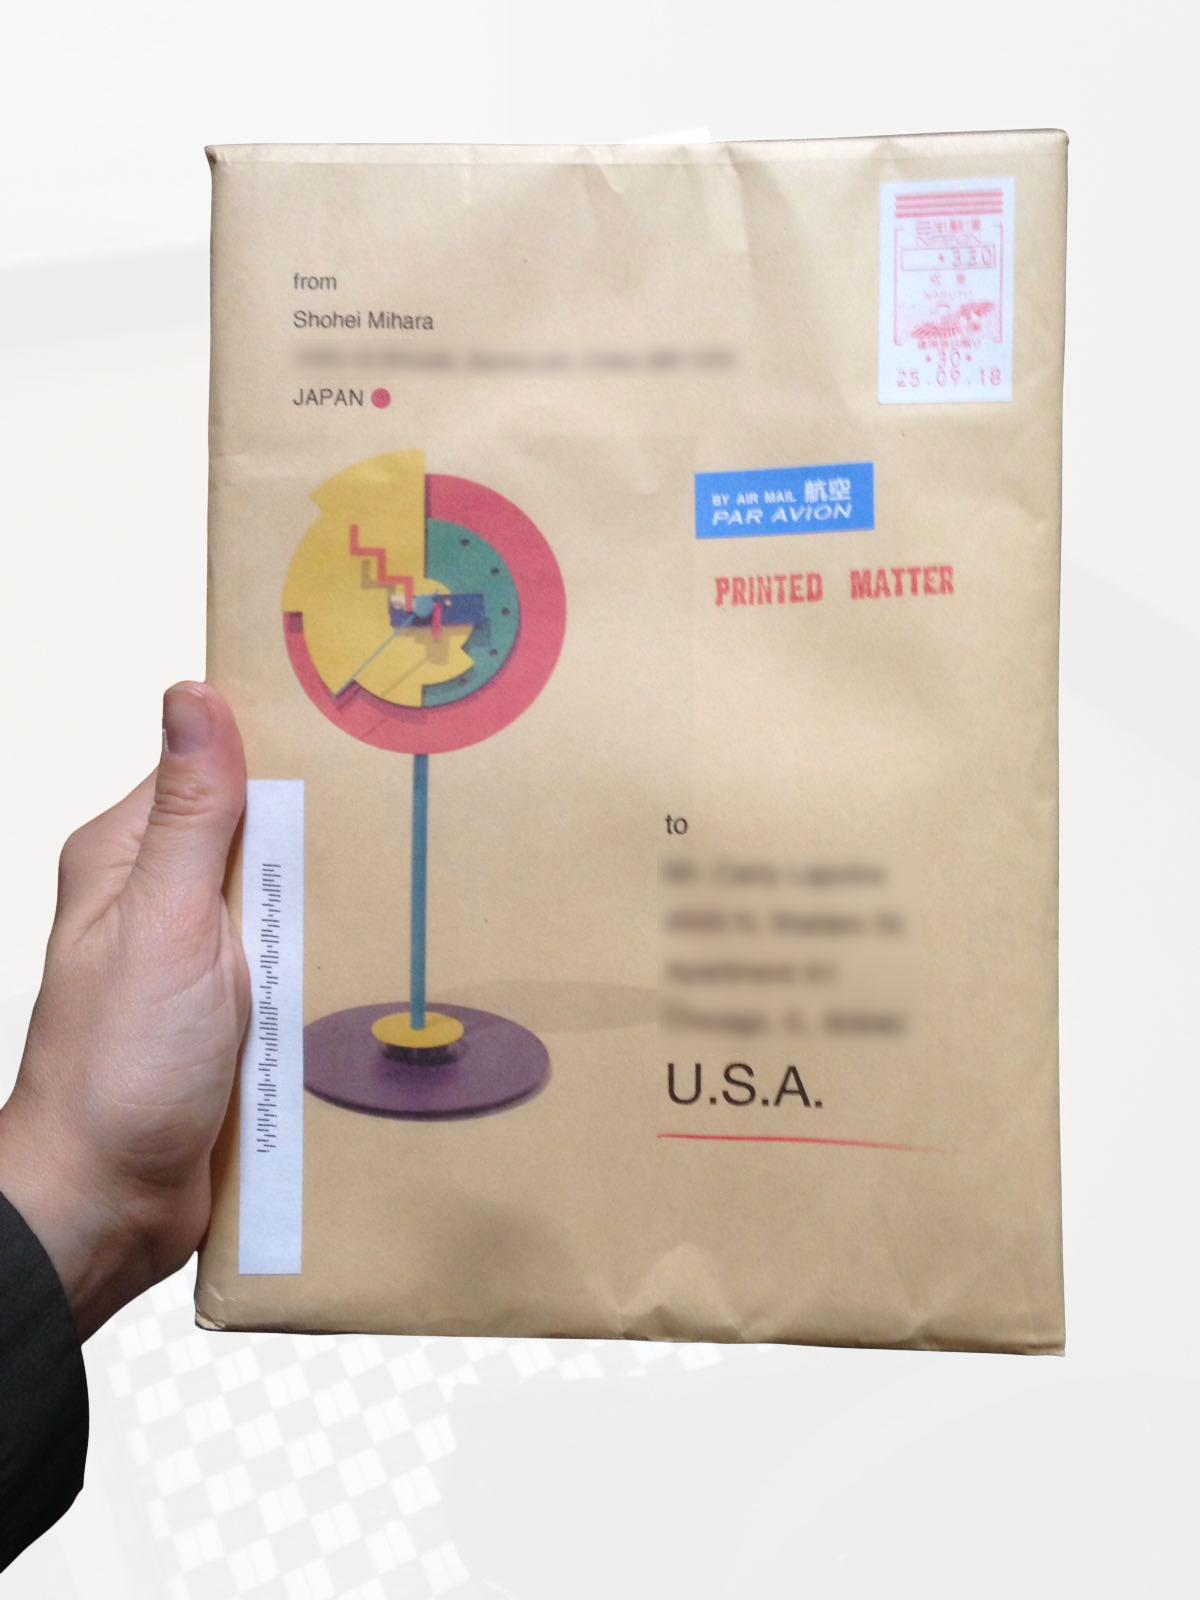 ShoheiMihara-Envelope-PostmodernTimesExhibition-2.jpg